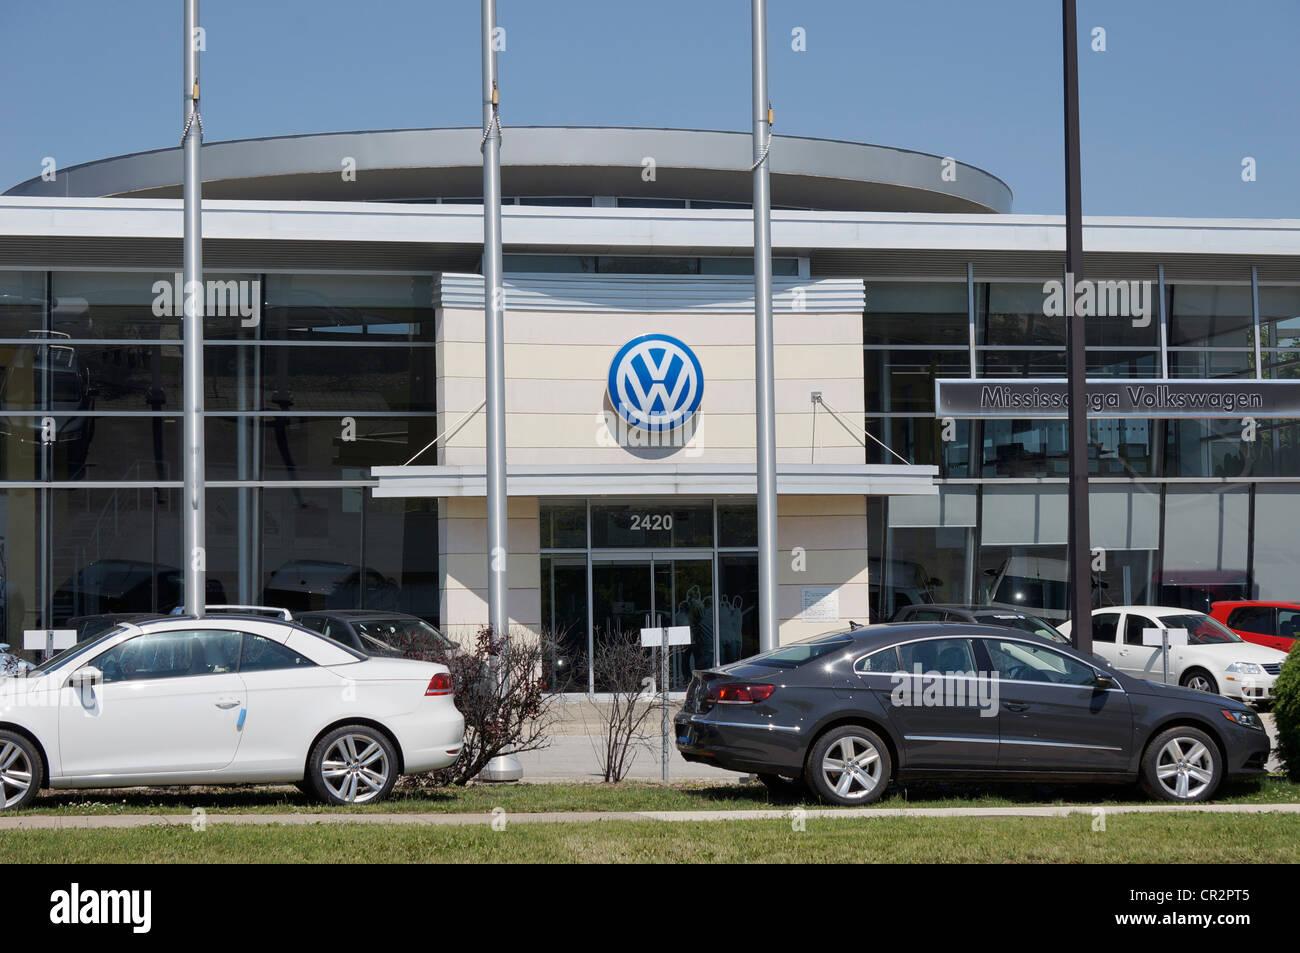 Volkswagen Autohaus Eingang Stockbild